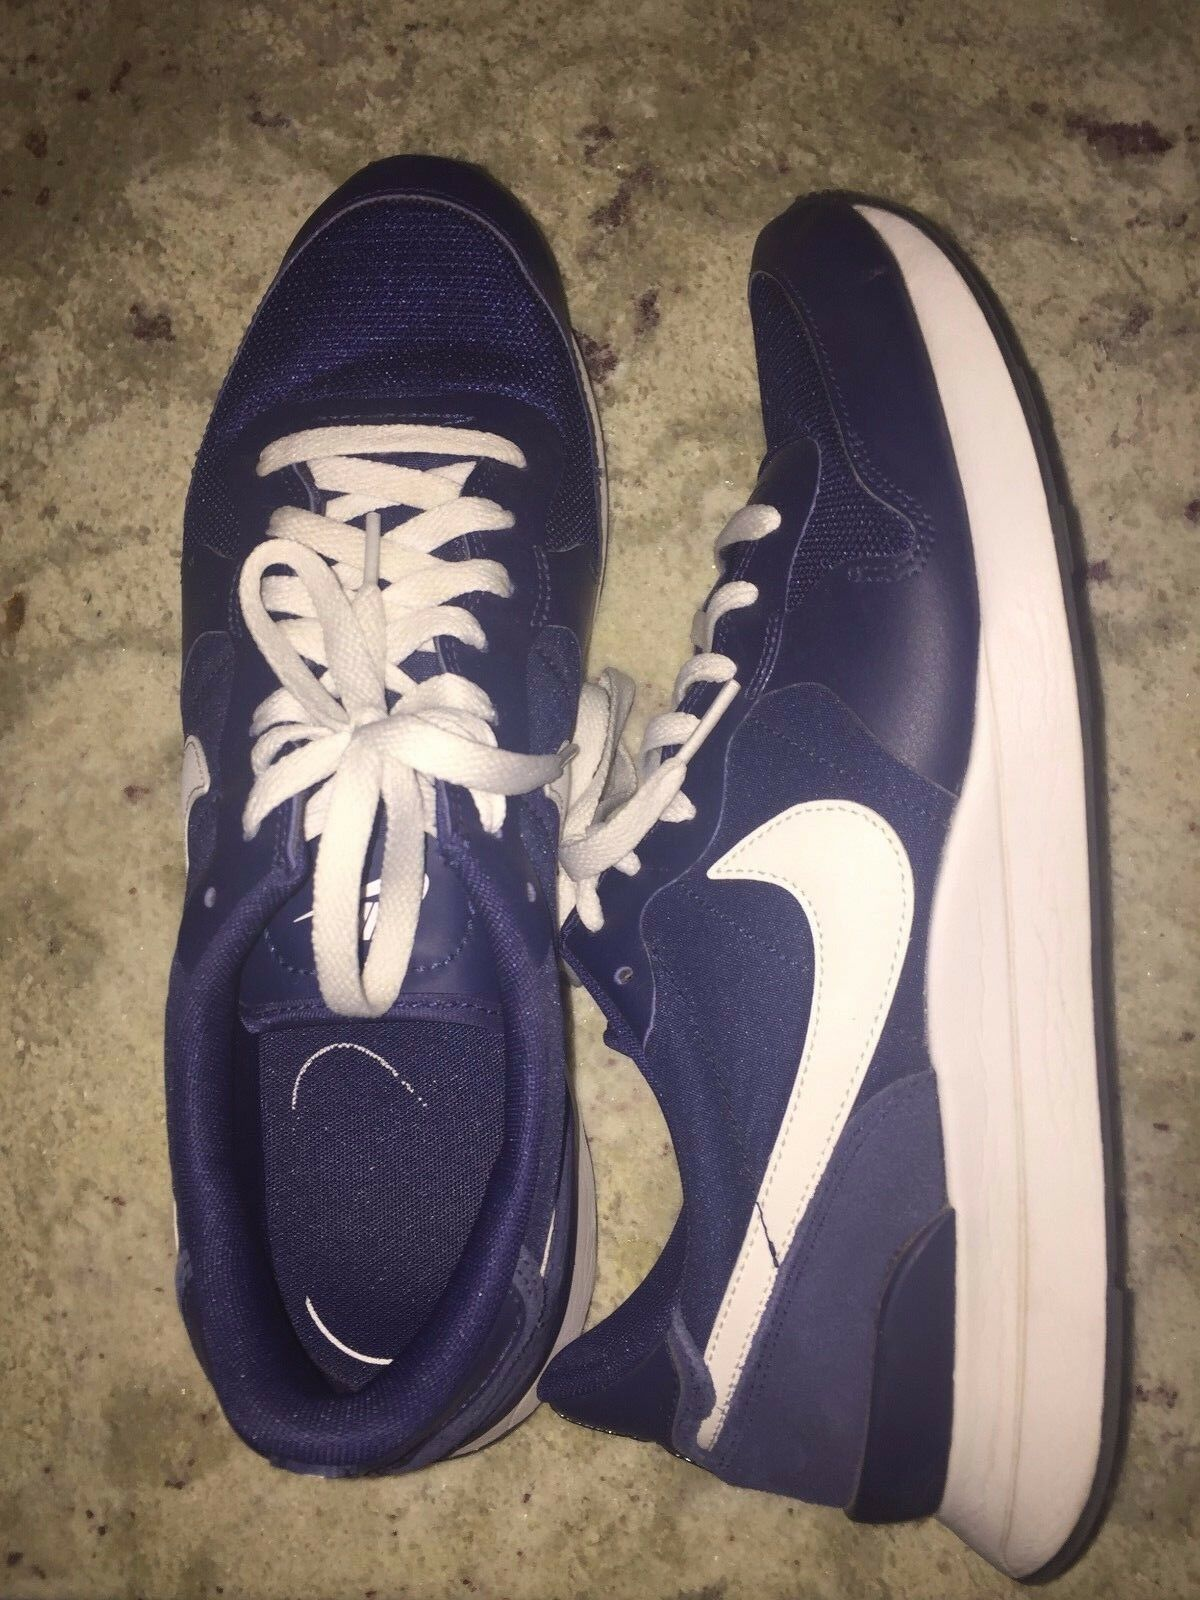 Mens Nike Internationalist Sneakers Blue White Sz US 10.5 Running Sport Training